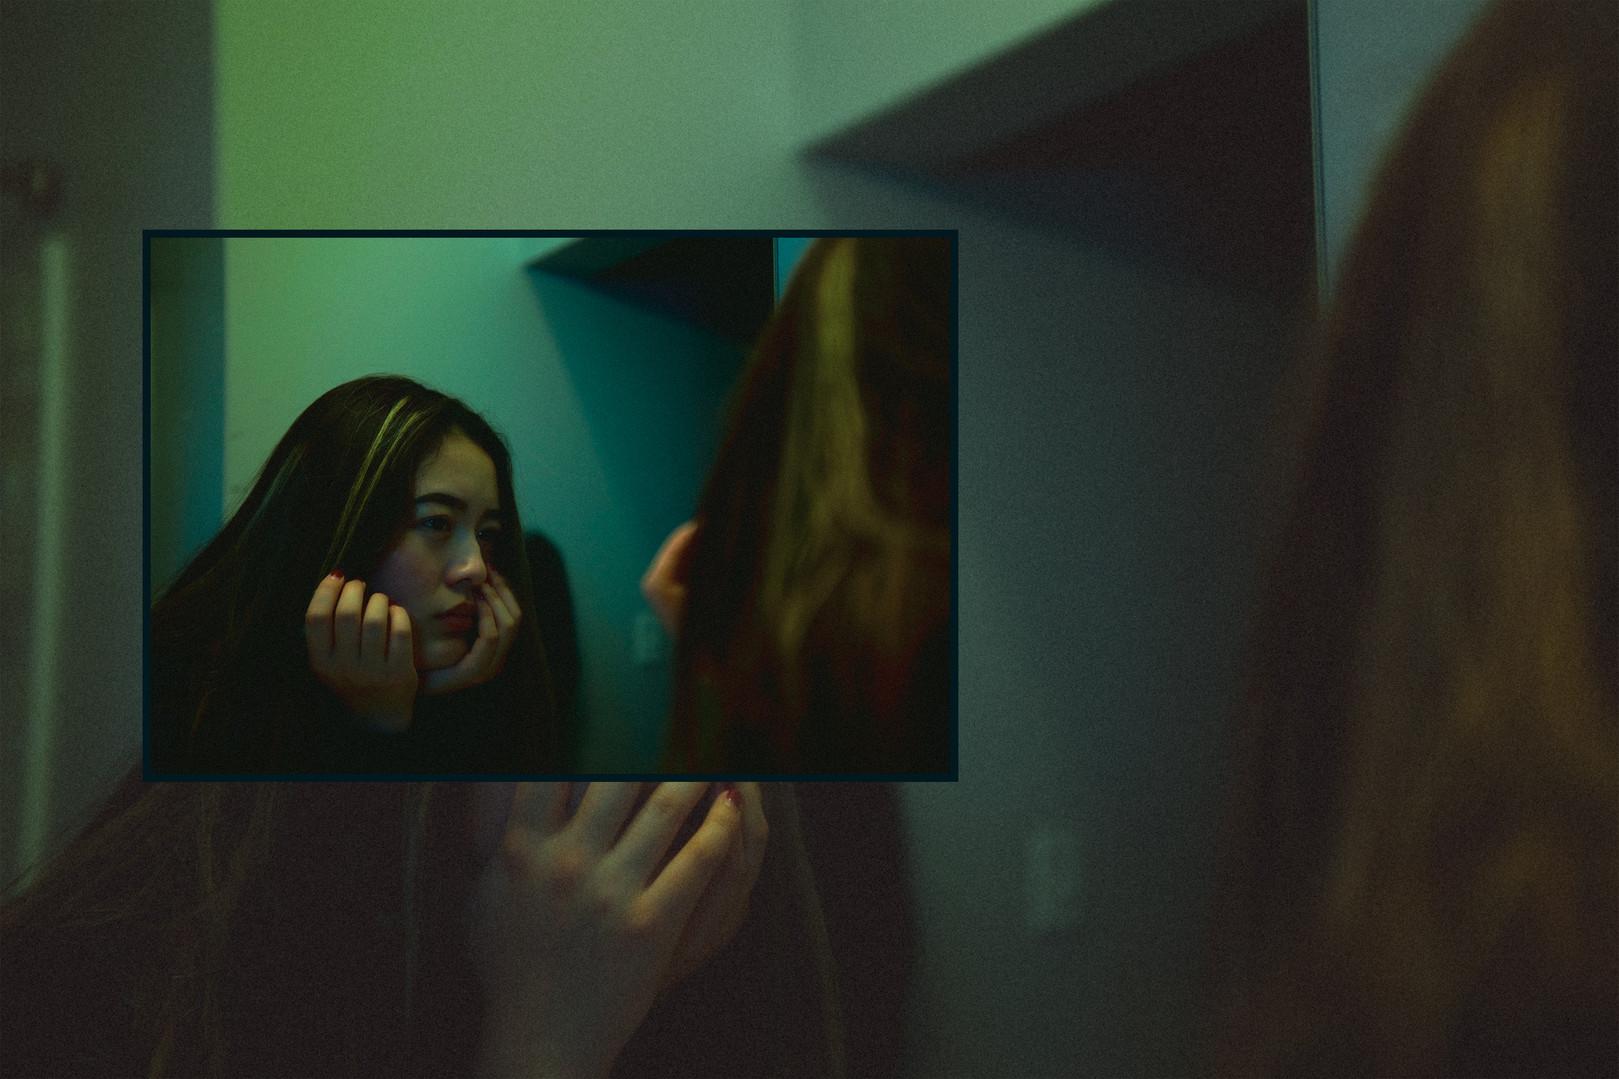 Kailyn-self-image-collage1.jpg